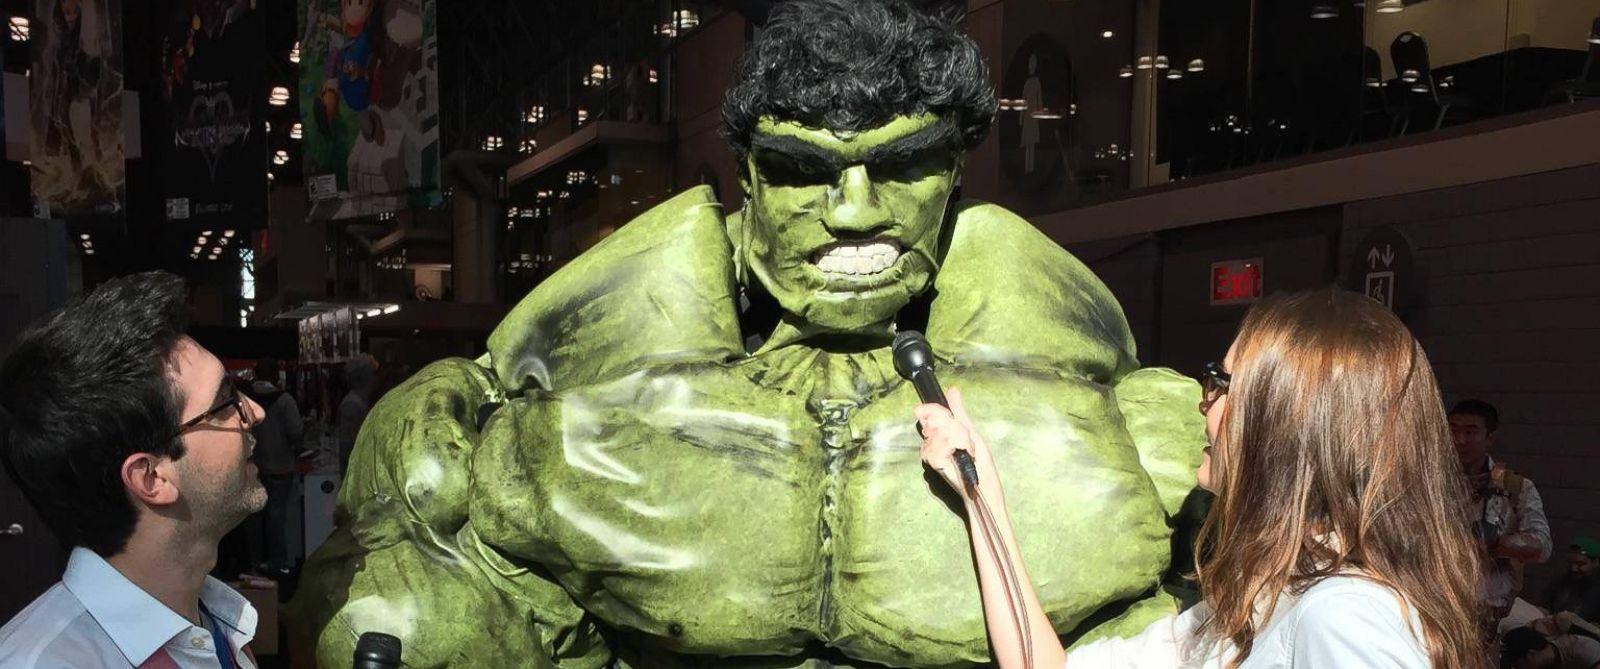 ht_comic_con_rothman_jef_161007_12x5_1600  sc 1 st  an INCREDIBLE HULK fan web site - WordPress.com & Incredible Hulk costume from New York Comic Con! | an INCREDIBLE ...